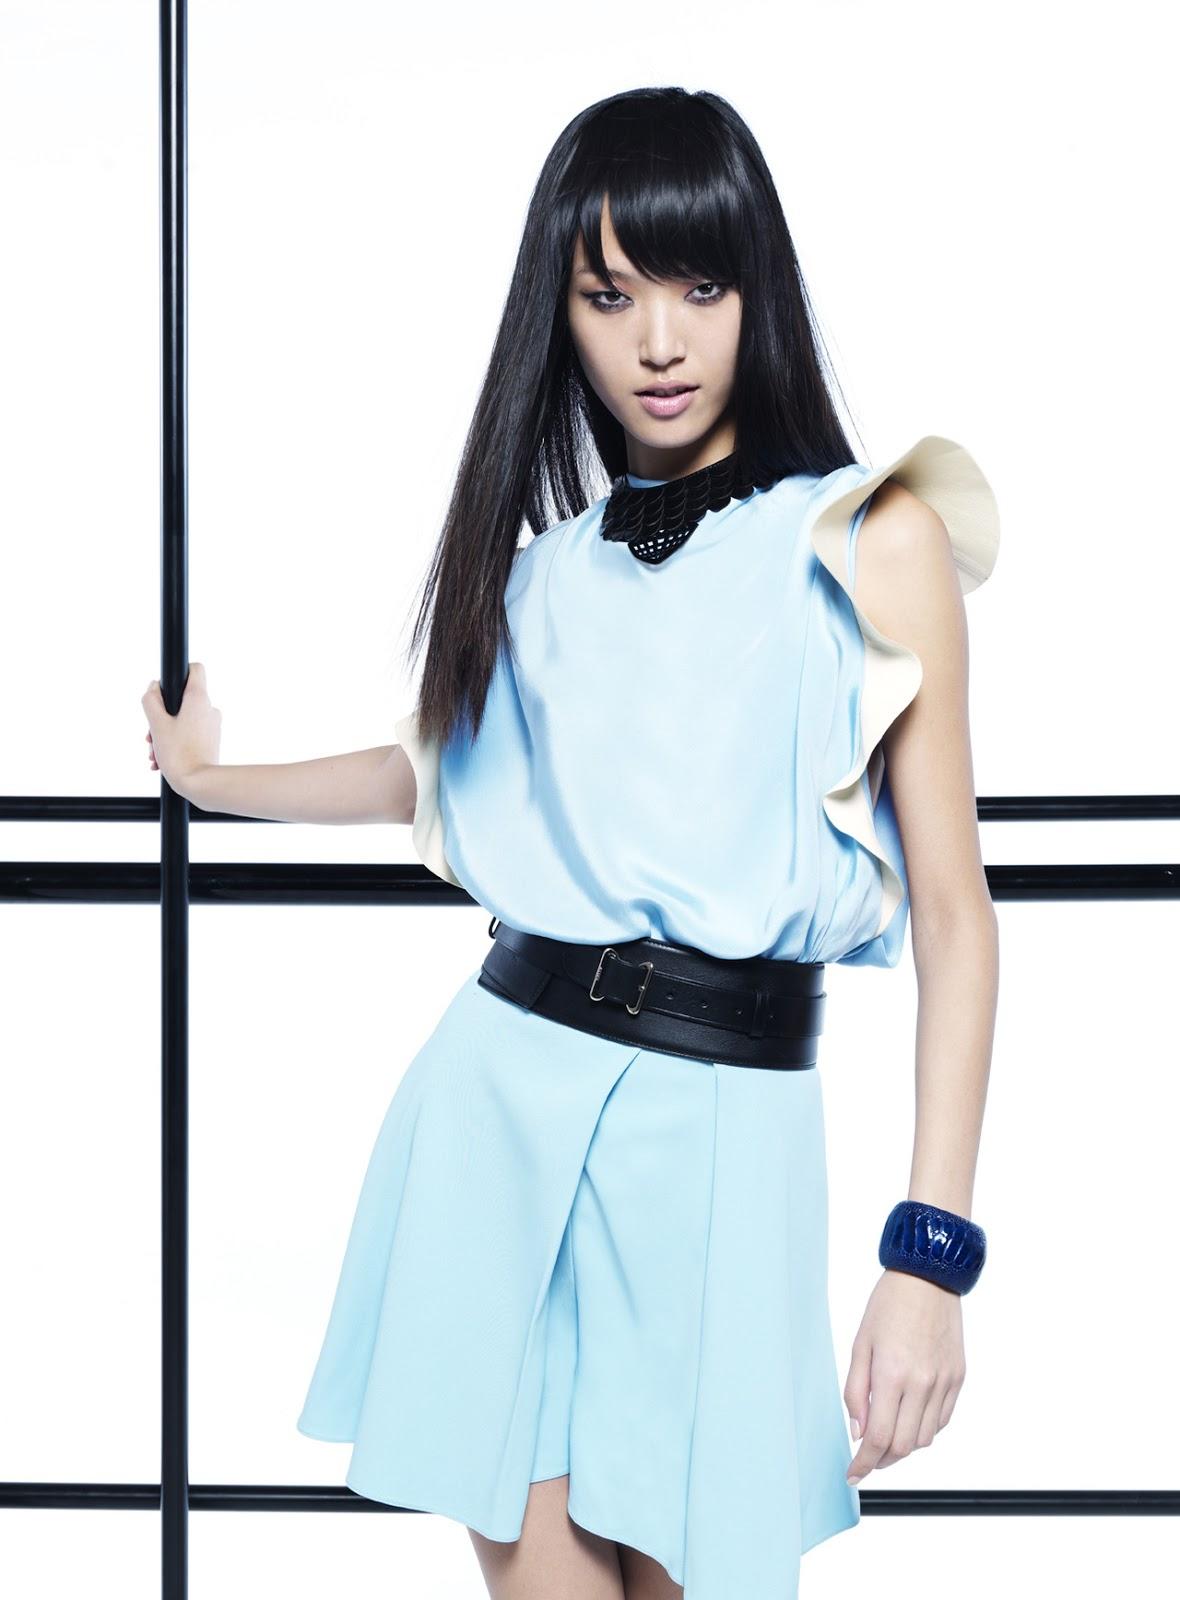 http://4.bp.blogspot.com/-Tit7RlYUzSU/UPU-7nupA8I/AAAAAAAAfhs/_aAS1lV84vg/s1600/Tian+Yi+by+Stockton+Johnson+%2528Modern+Pastel+-+Vogue+China+January+2013%2529.jpg